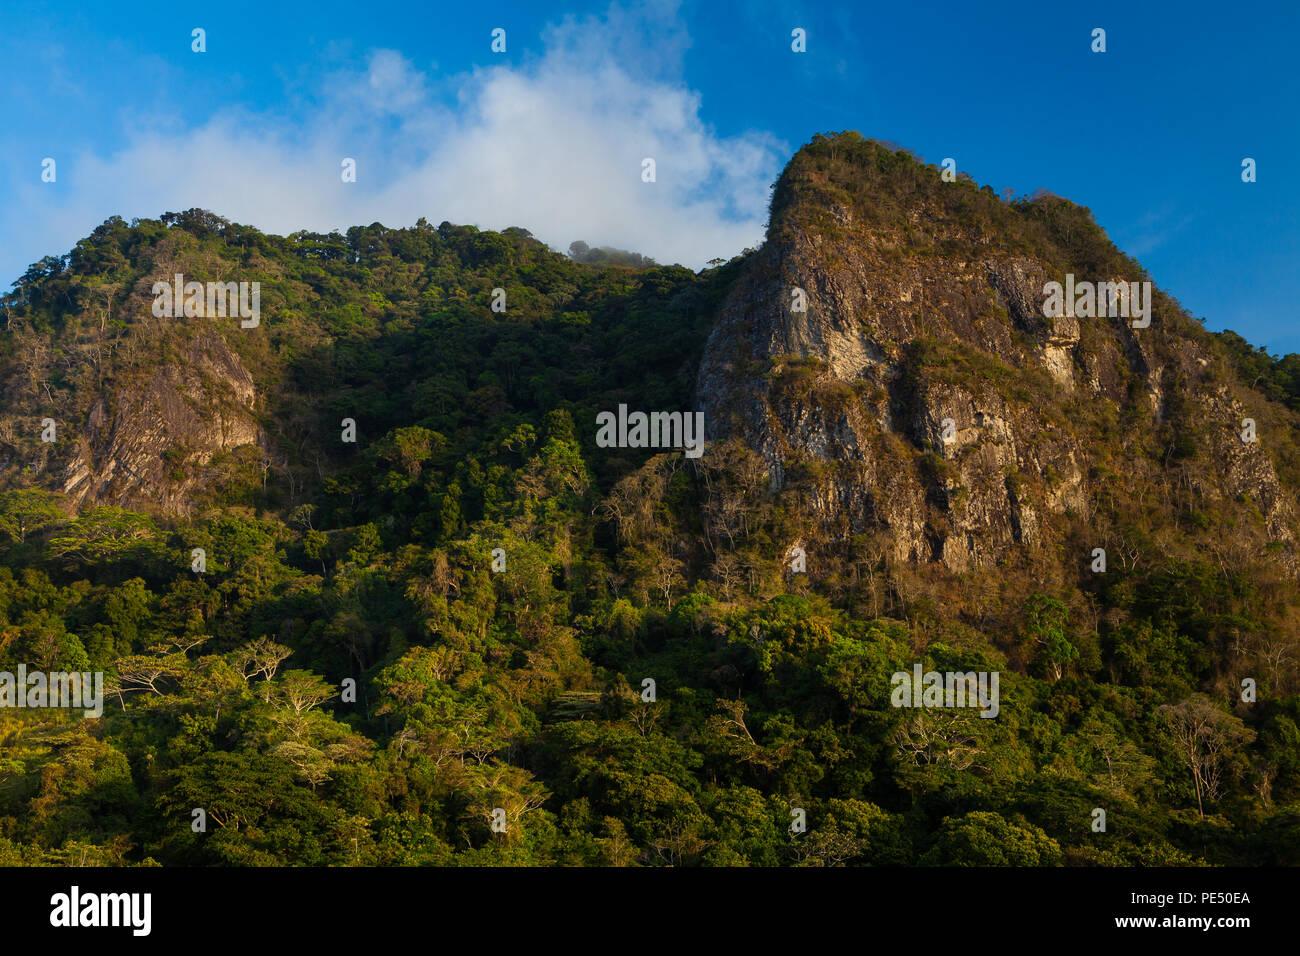 Early morning light on the cloudforest and Cerro la Cruz (right) in Altos de Campana national park, Cordillera Central, Republic of Panama. Stock Photo